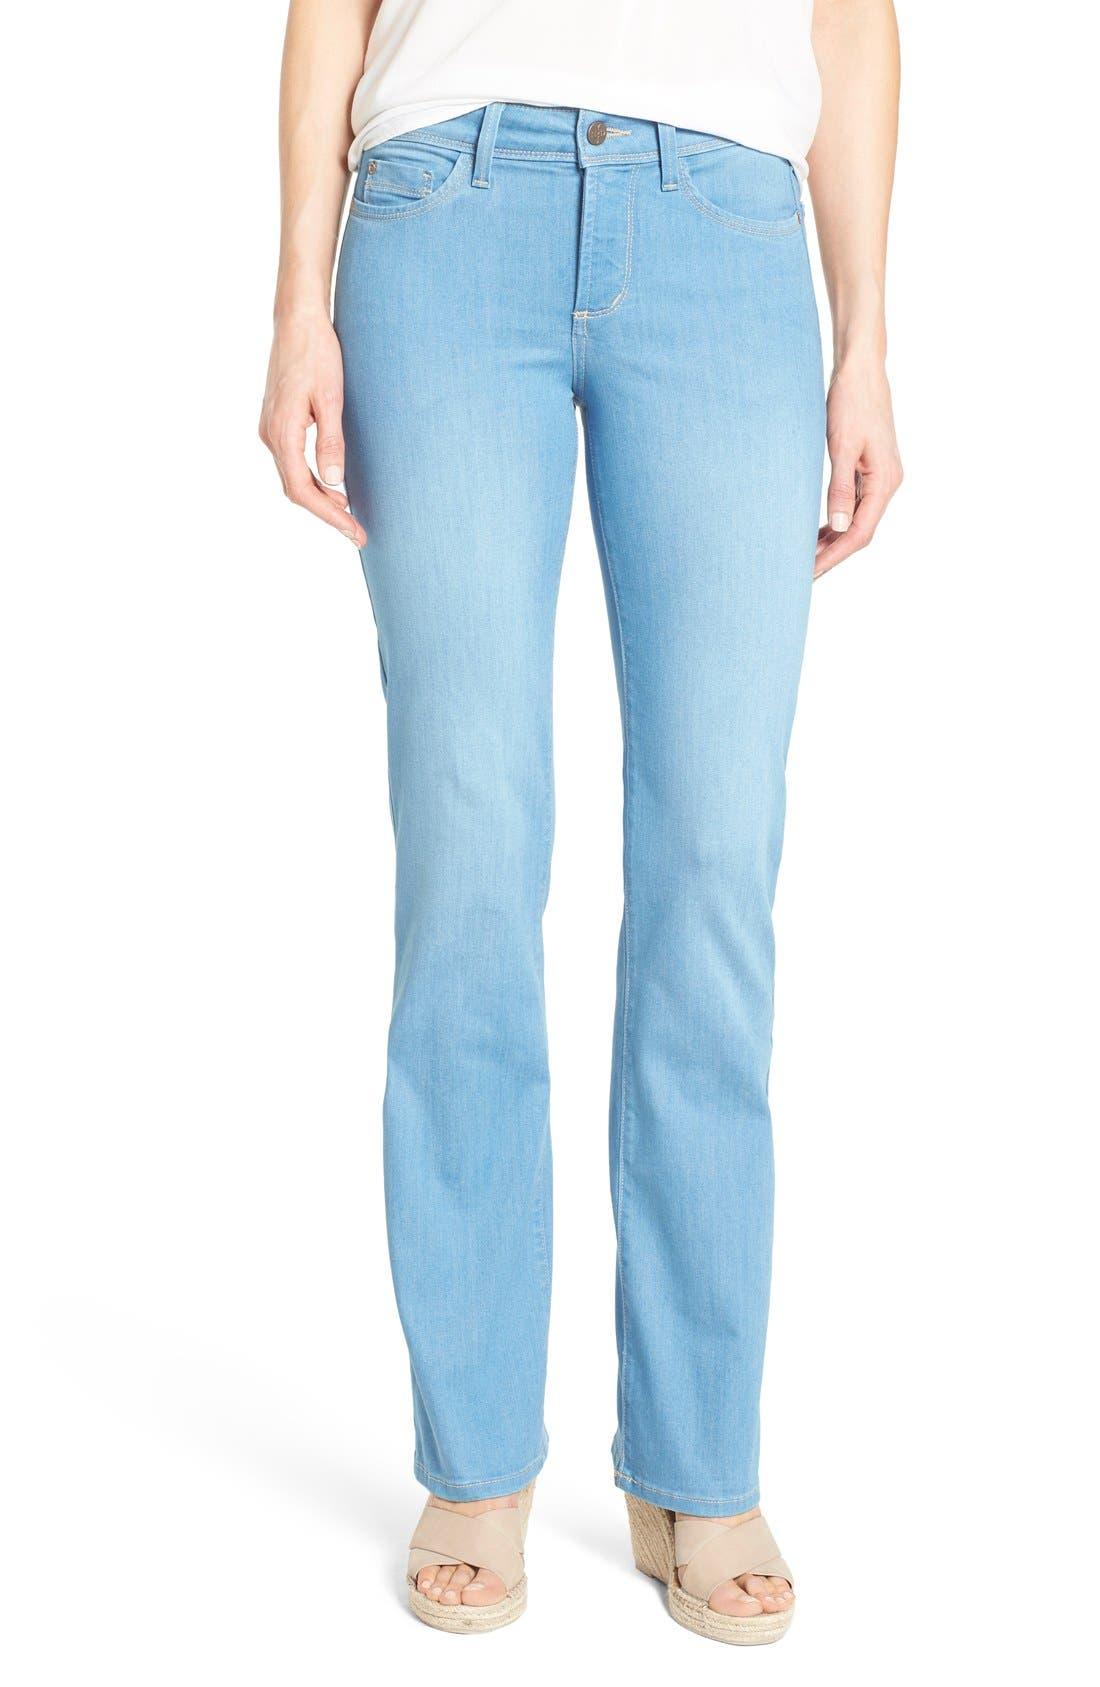 Main Image - NYDJ 'Barbara' Stretch Bootcut Jeans (Palm Bay)